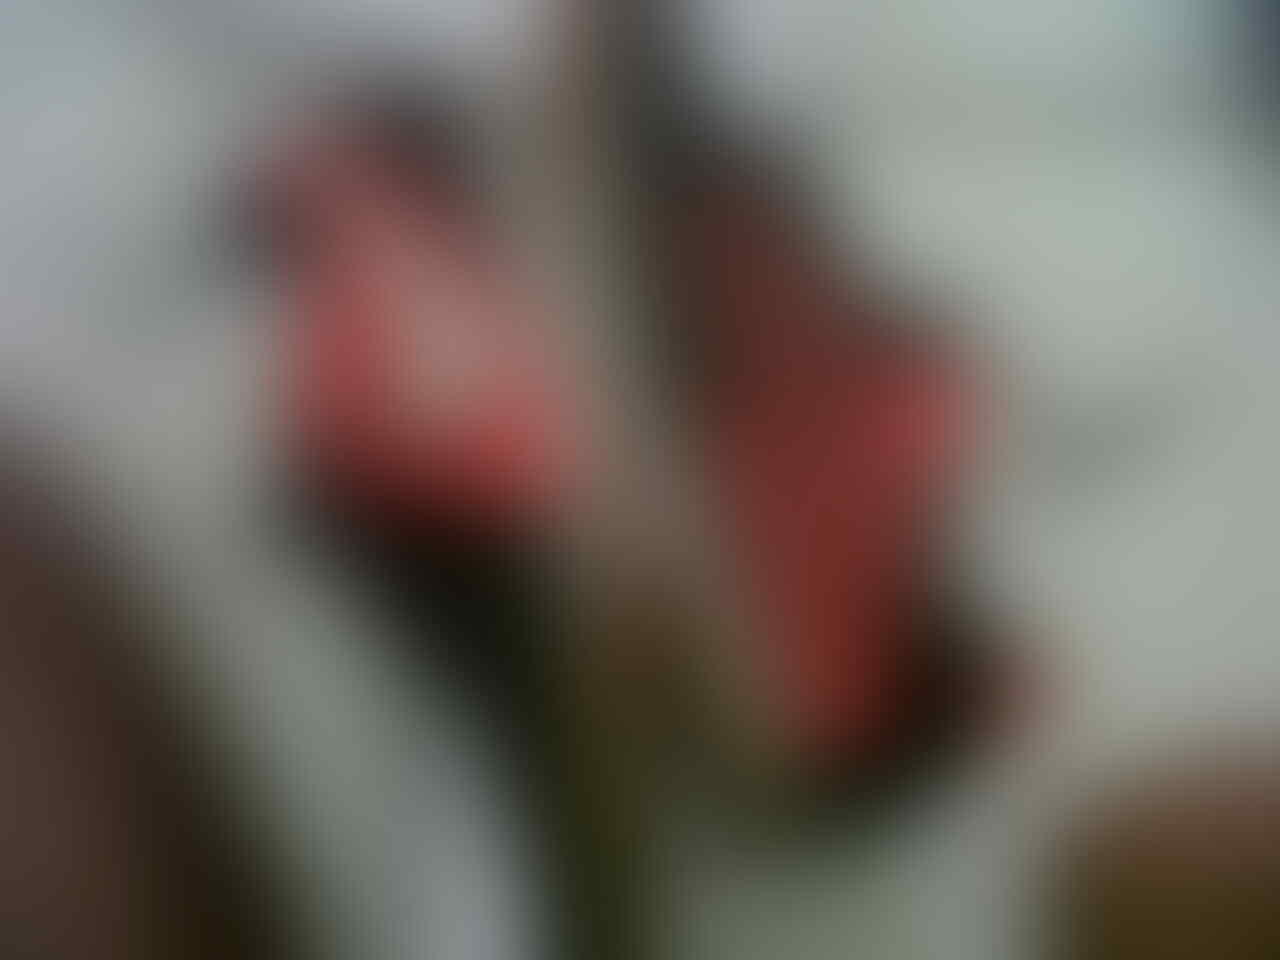 [WTS] Sepatu futsal Nike Ctr 360 ori 2nd size 44